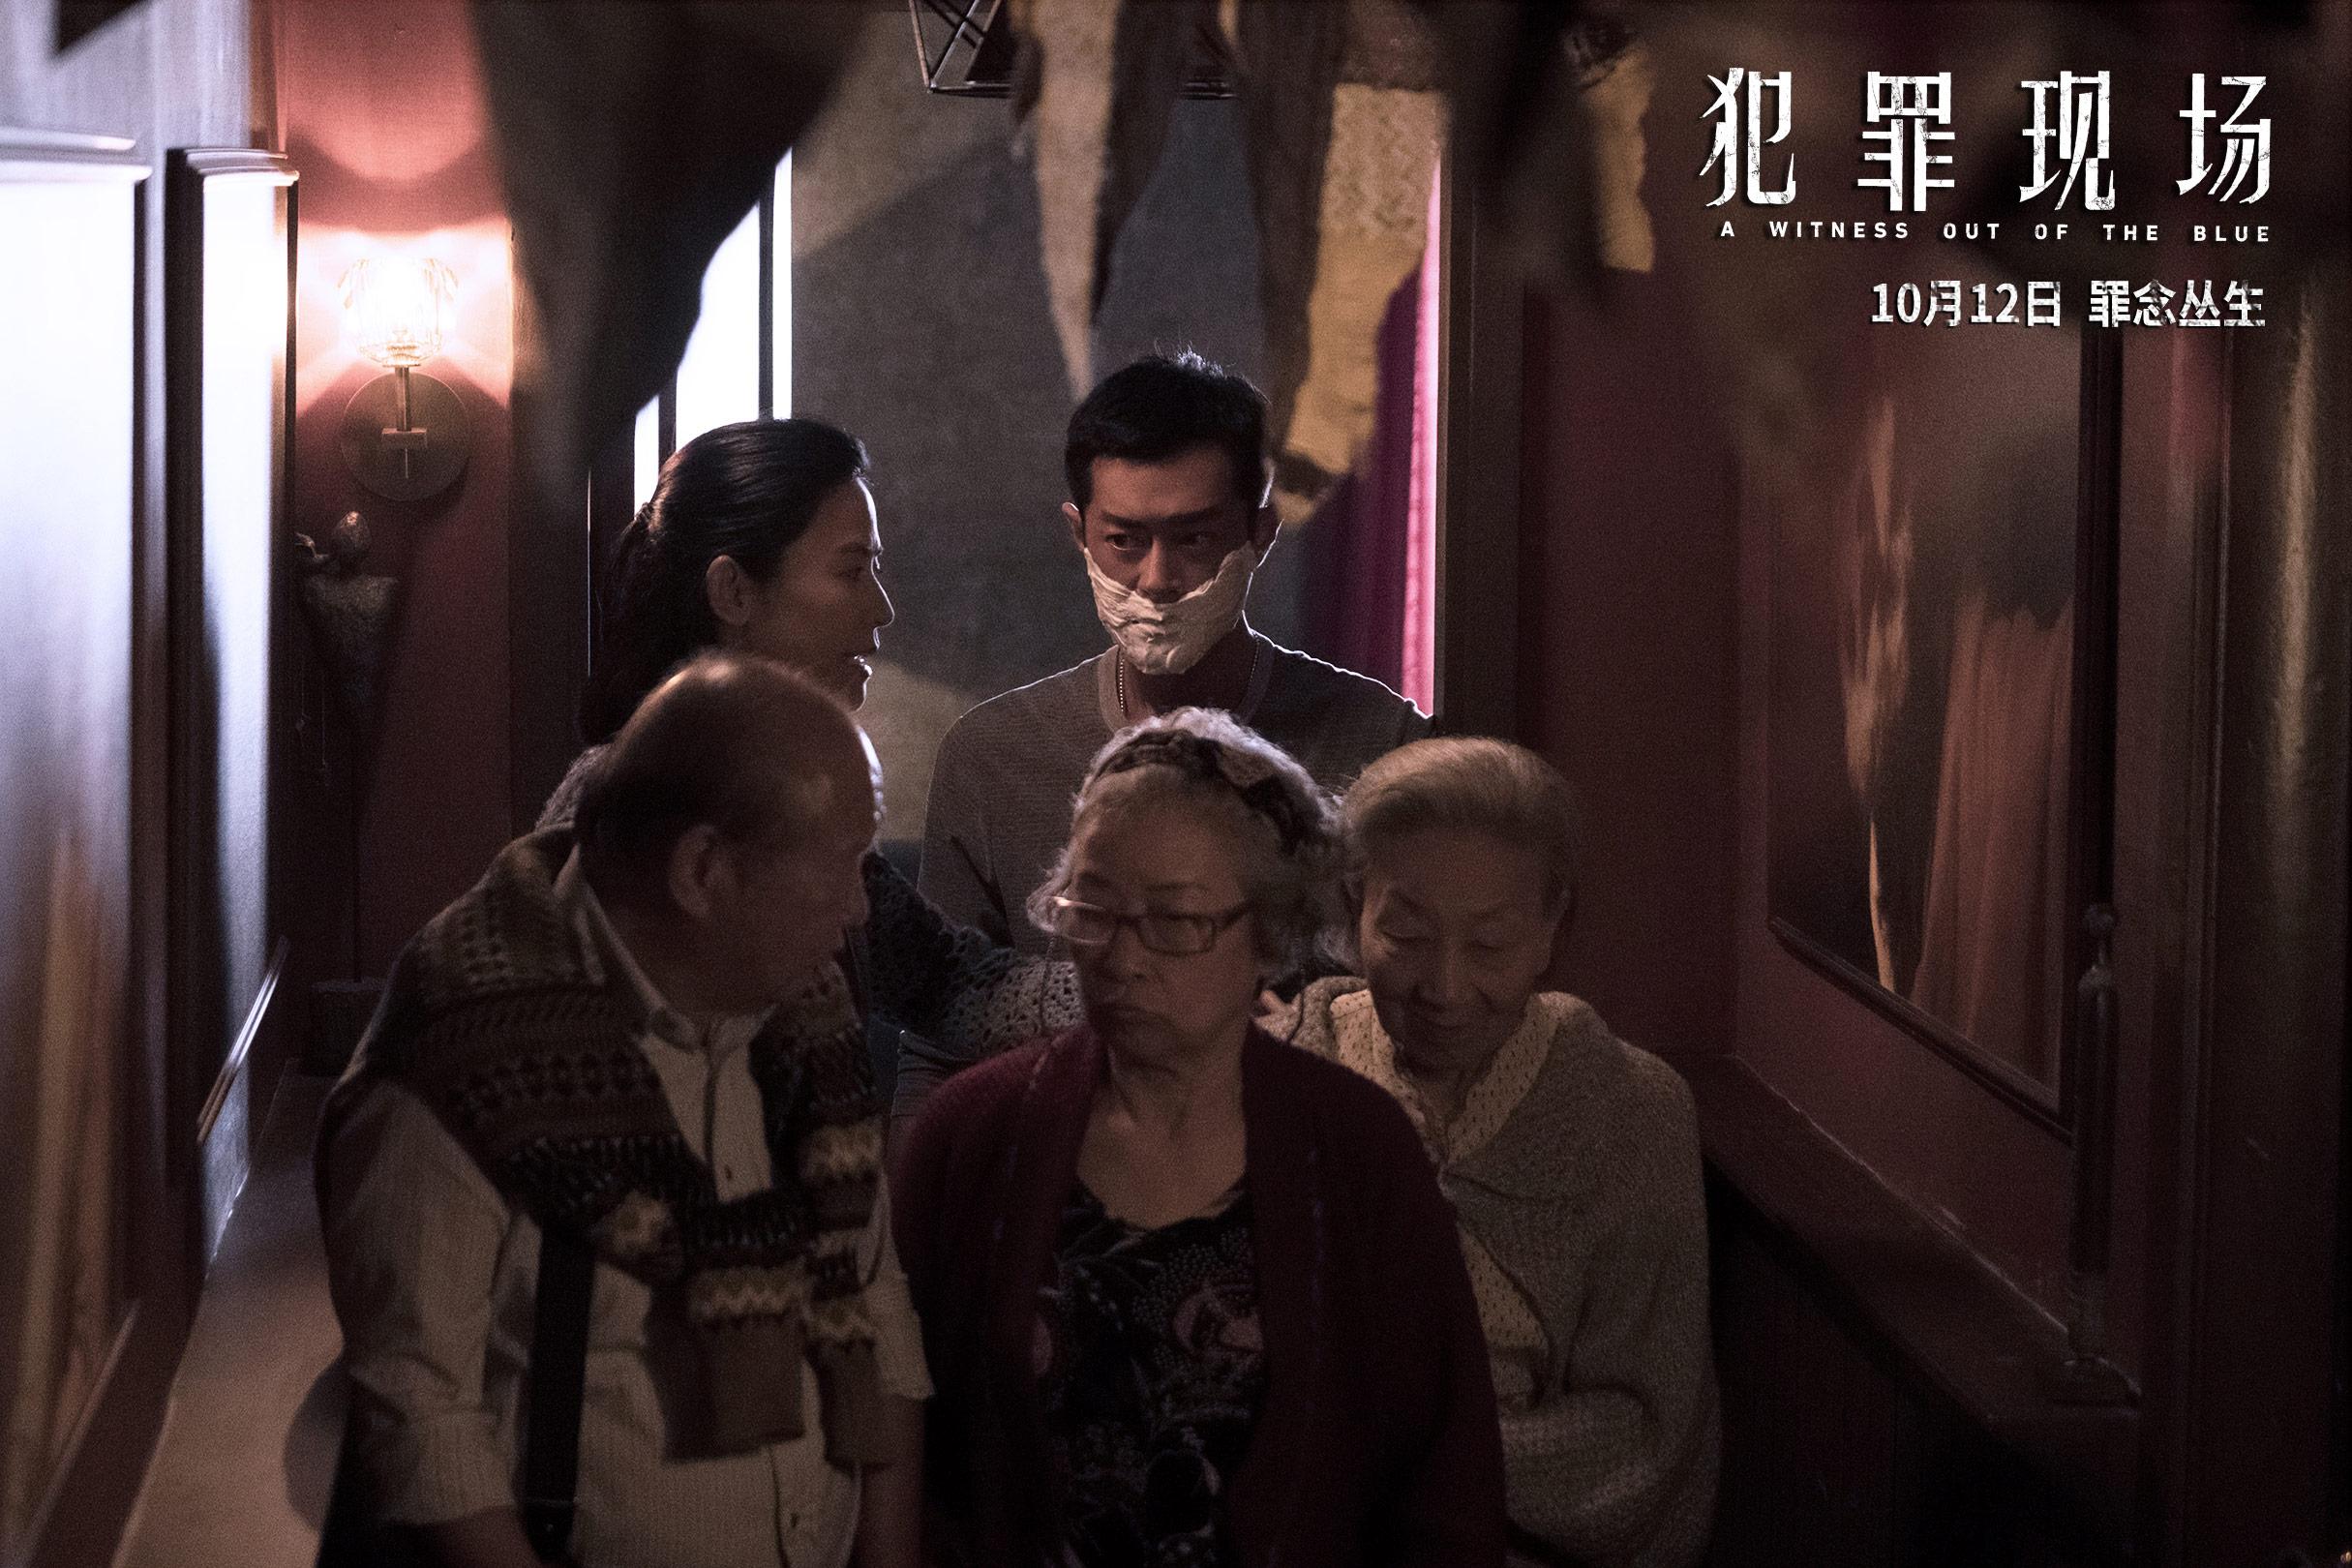 www.22gvb.com_古天乐宣萱《建功现场》剧照 将于10月12日上映